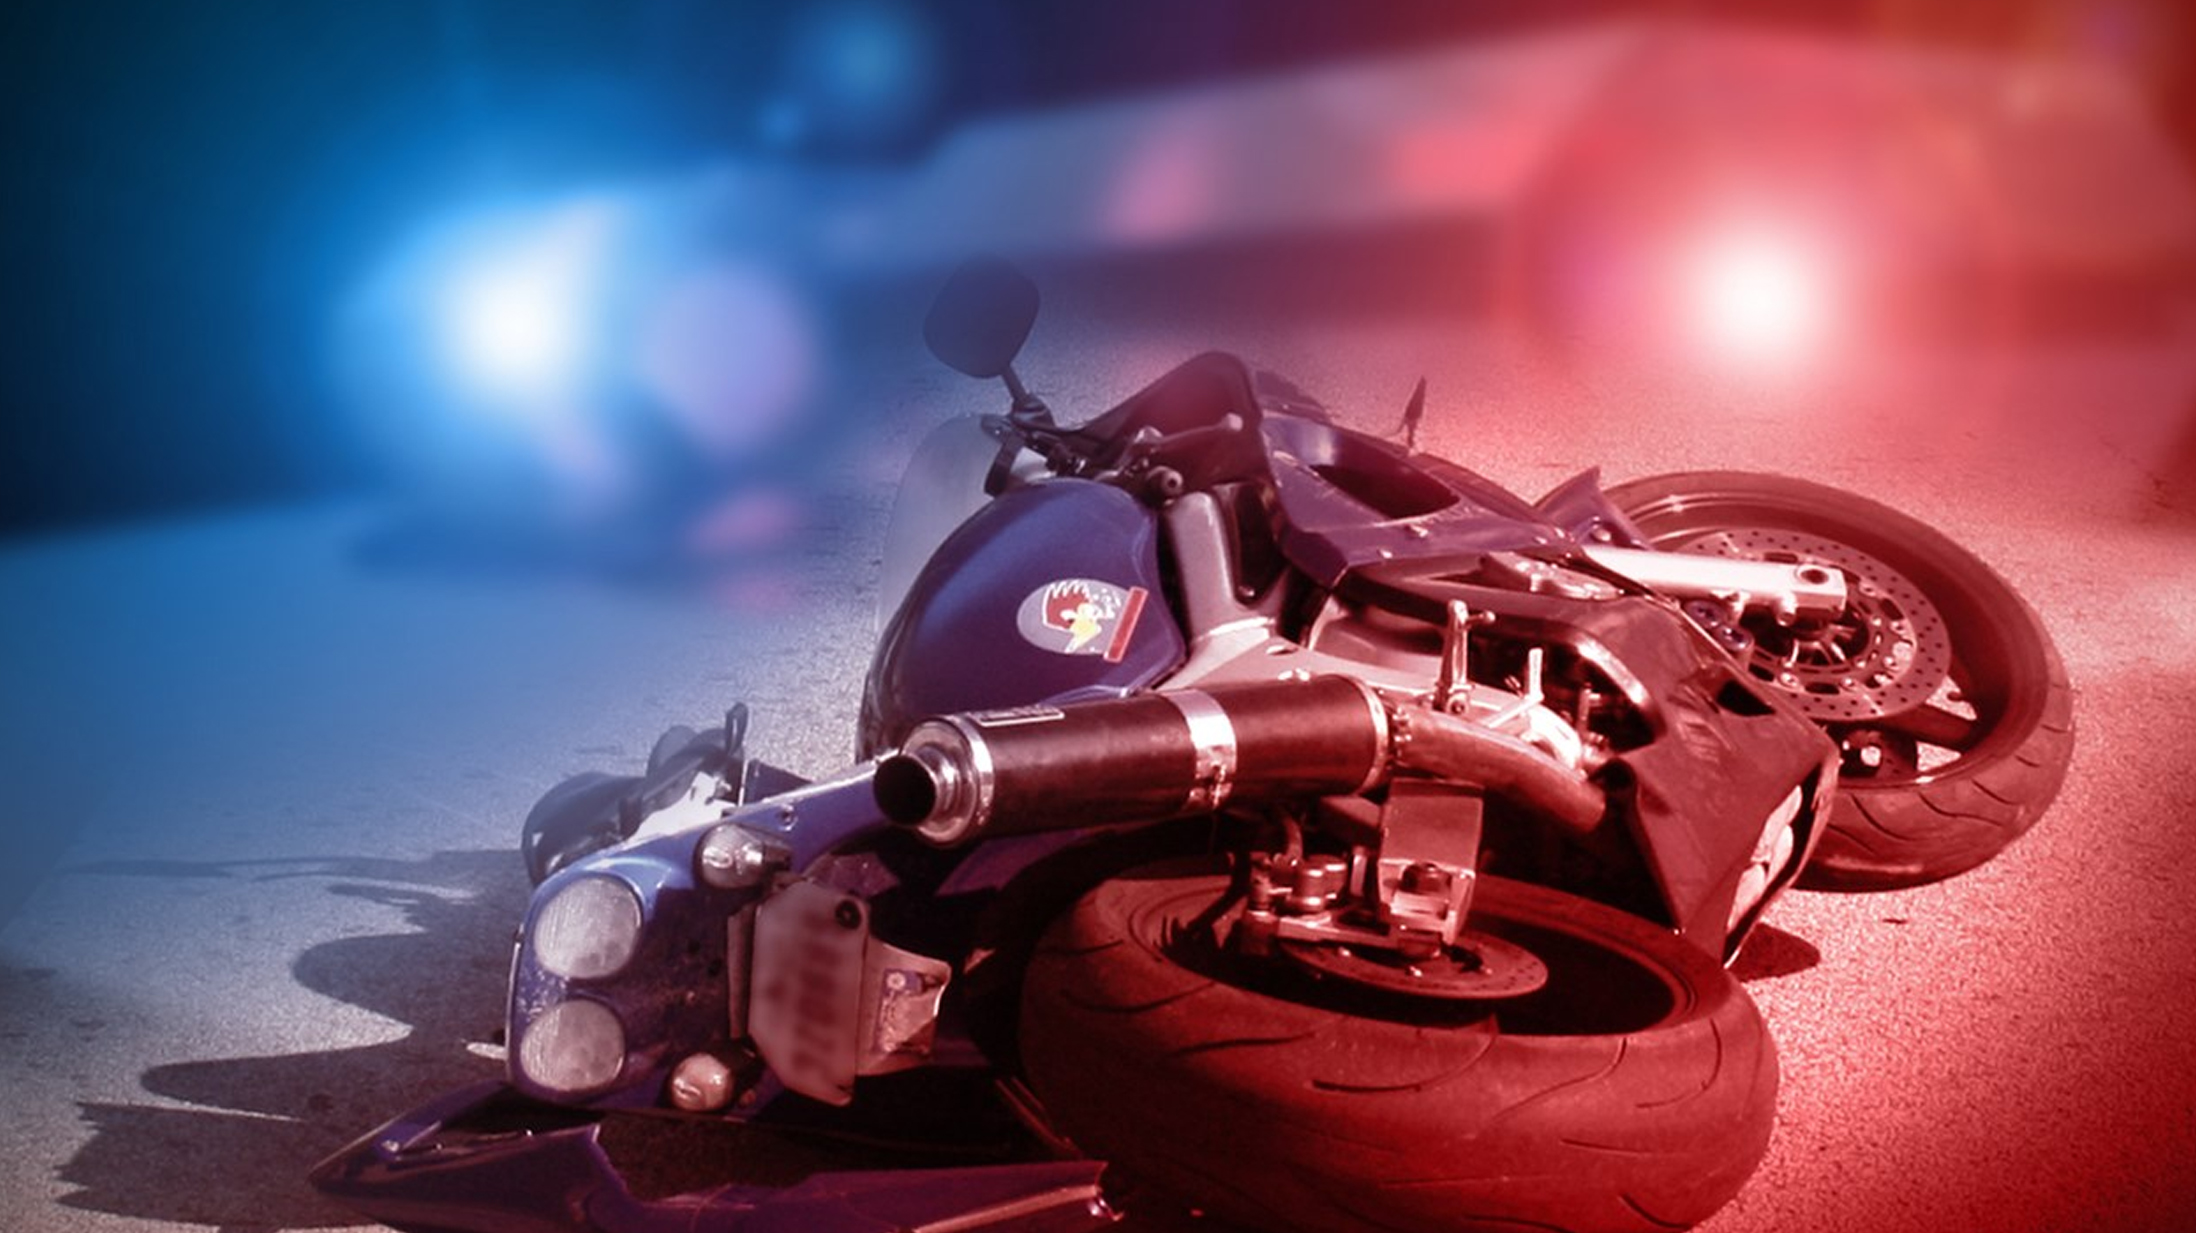 Motorcycle Crash Generic FOR WEB_1454098471005.jpg